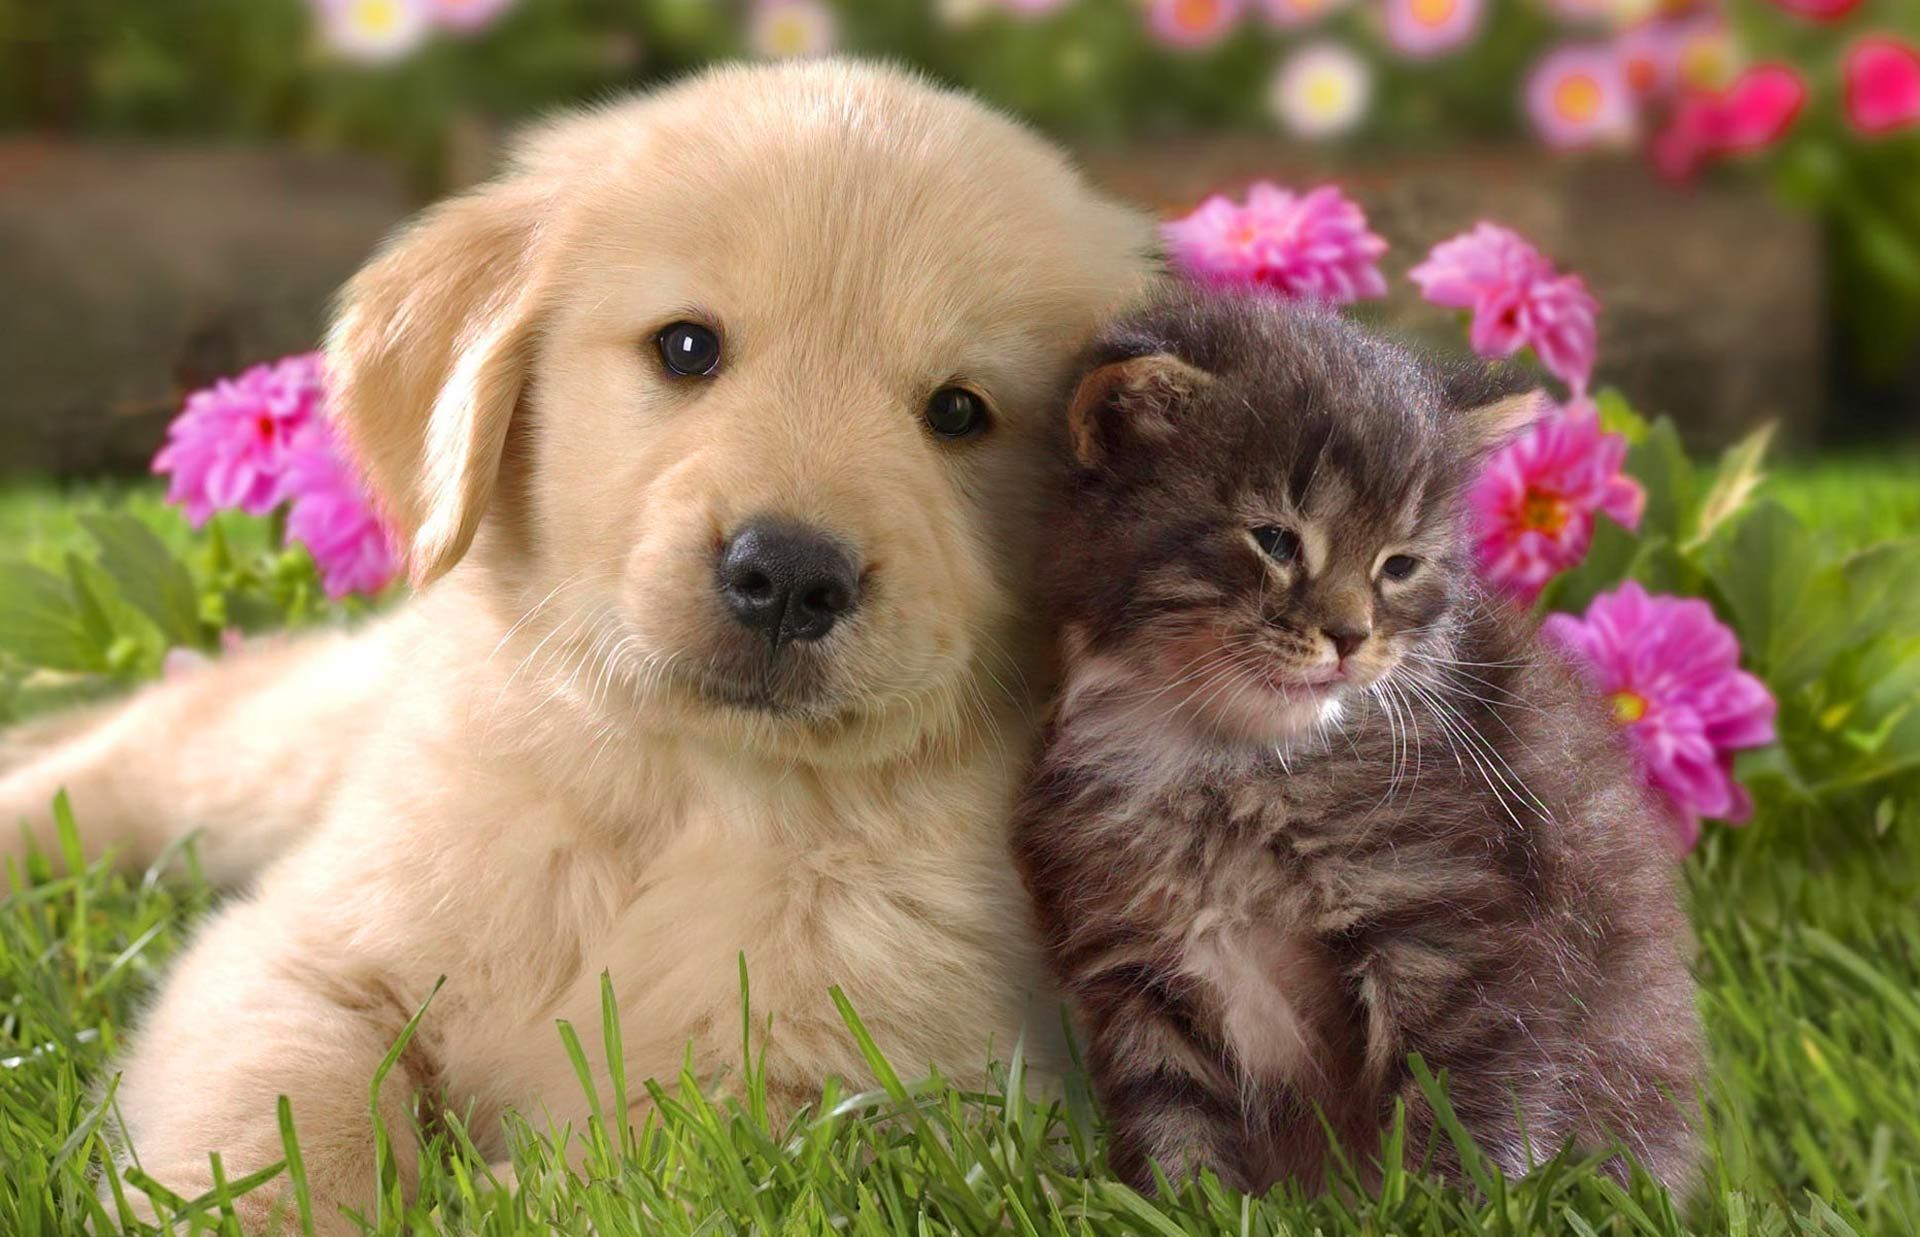 Fondo Pantalla Perro Y Gato